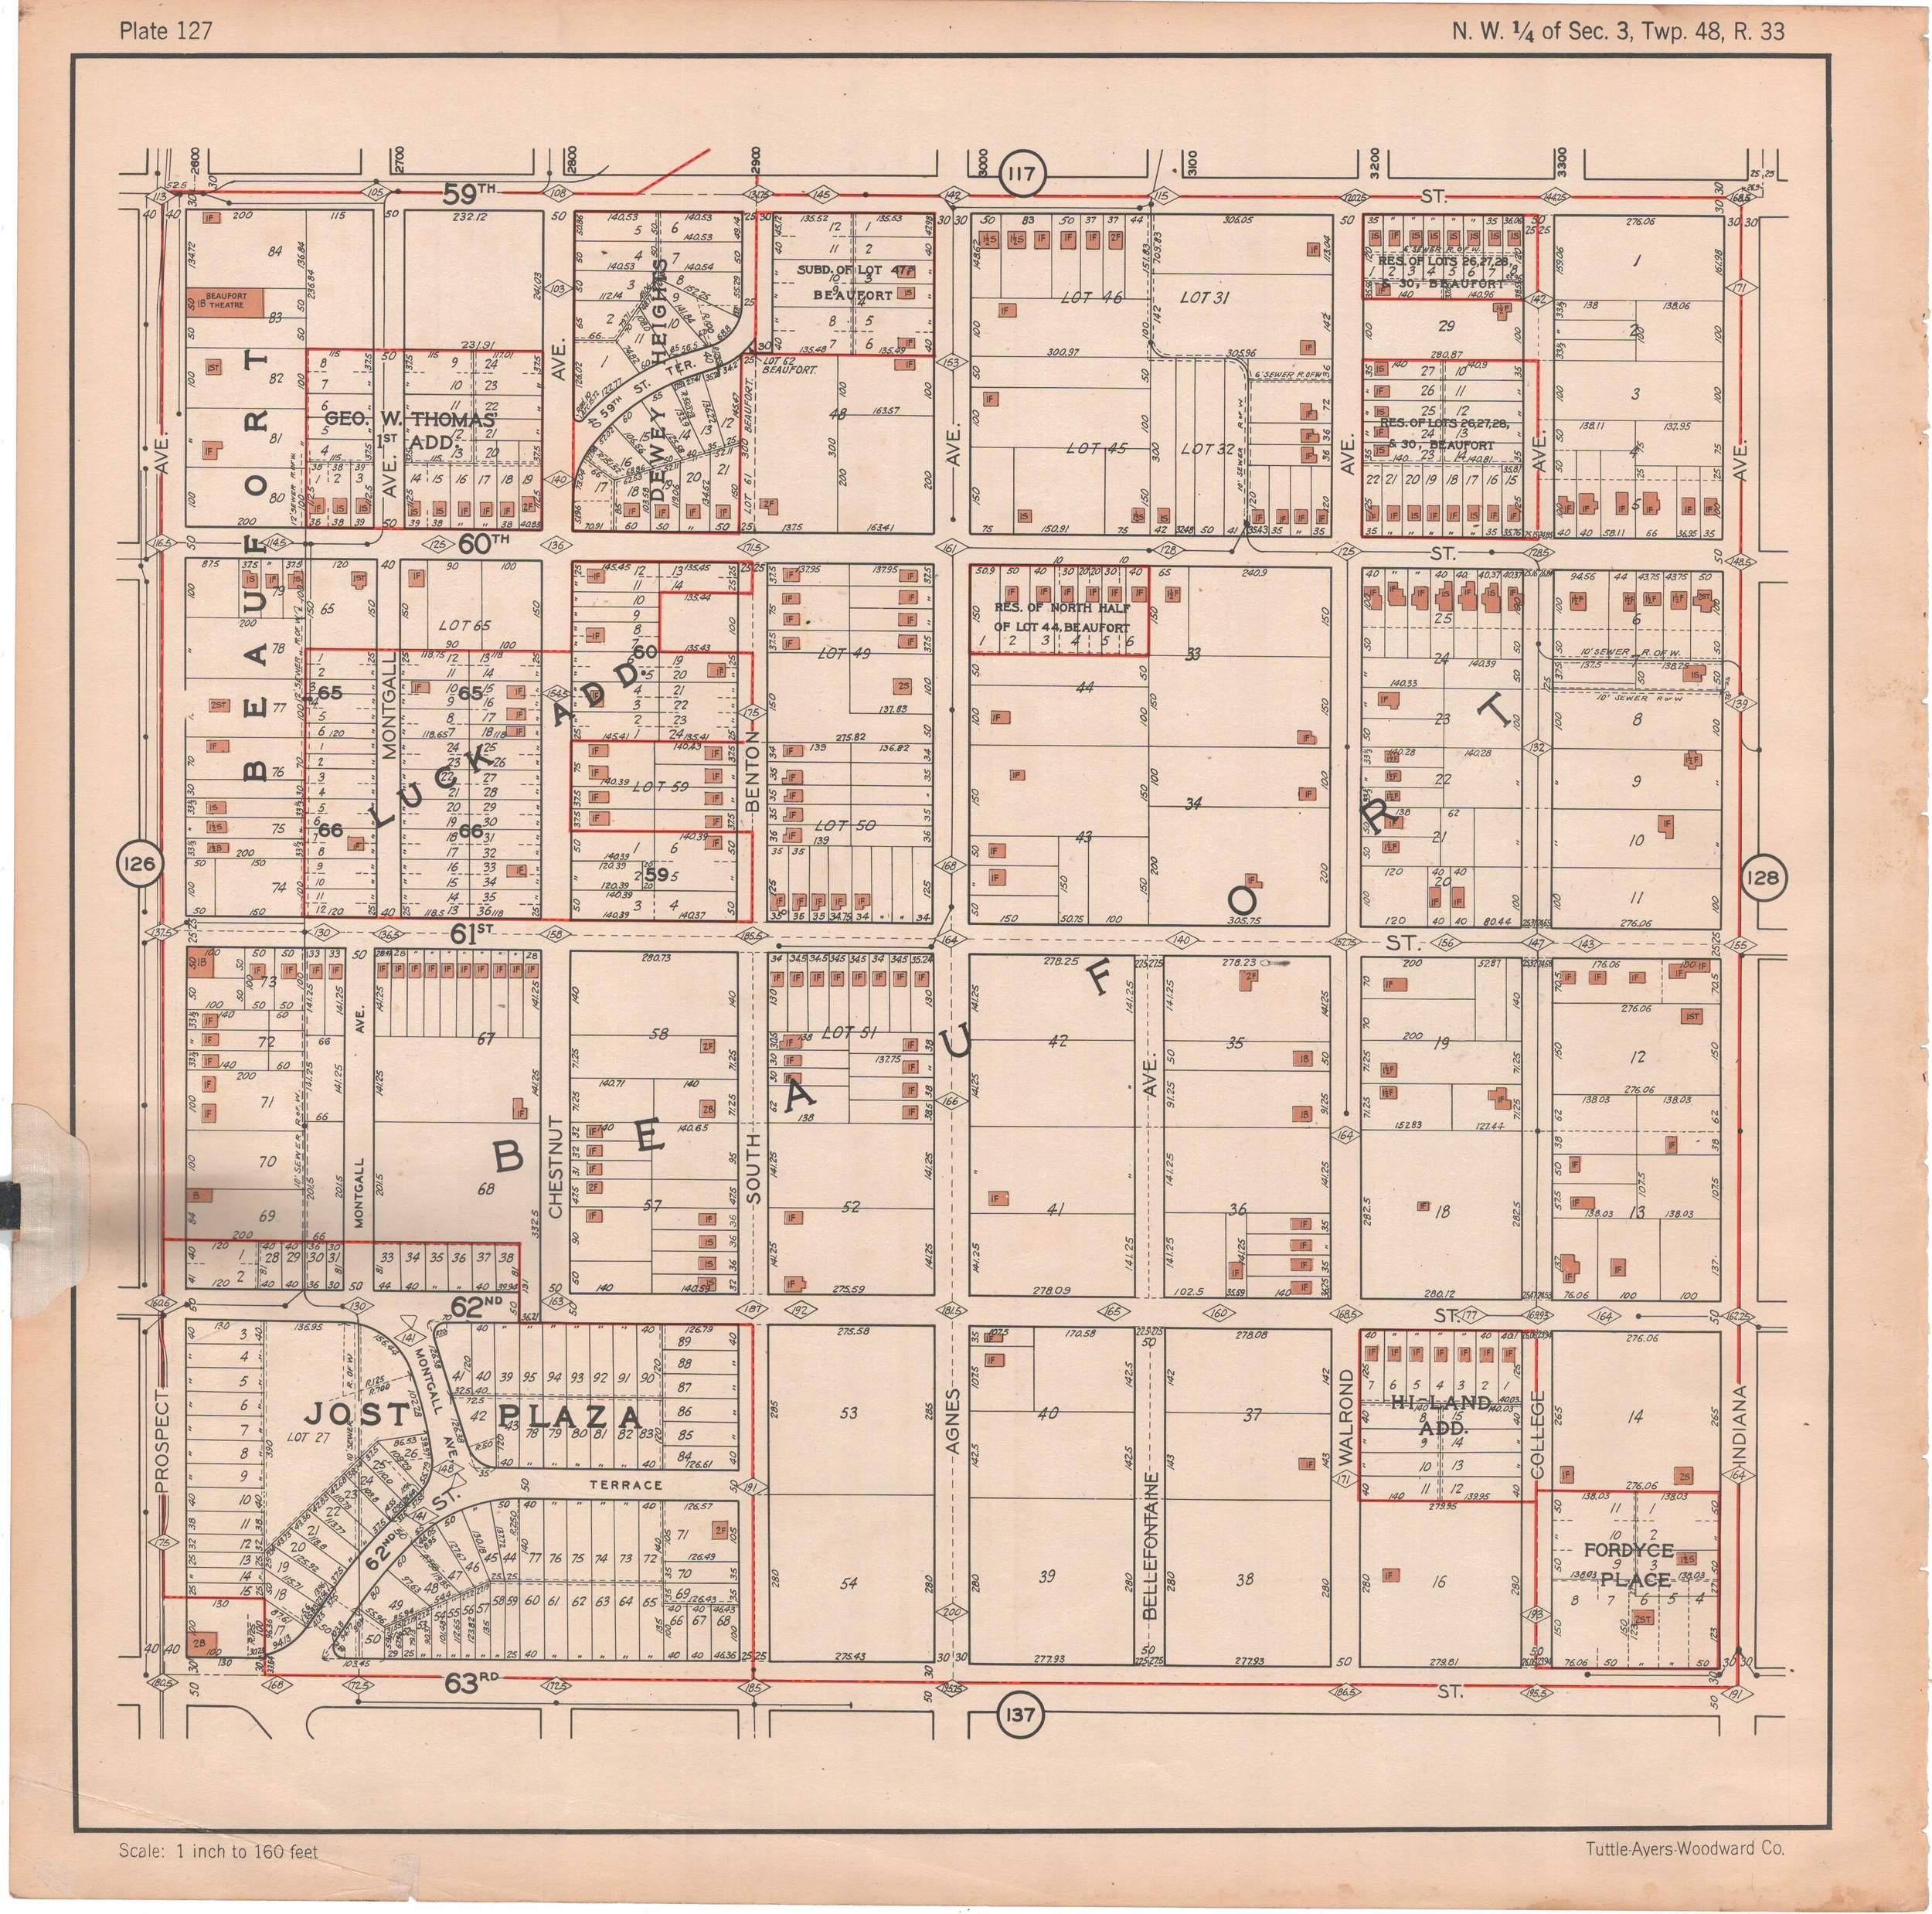 1925 TUTTLE_AYERS_Plate 127.JPG